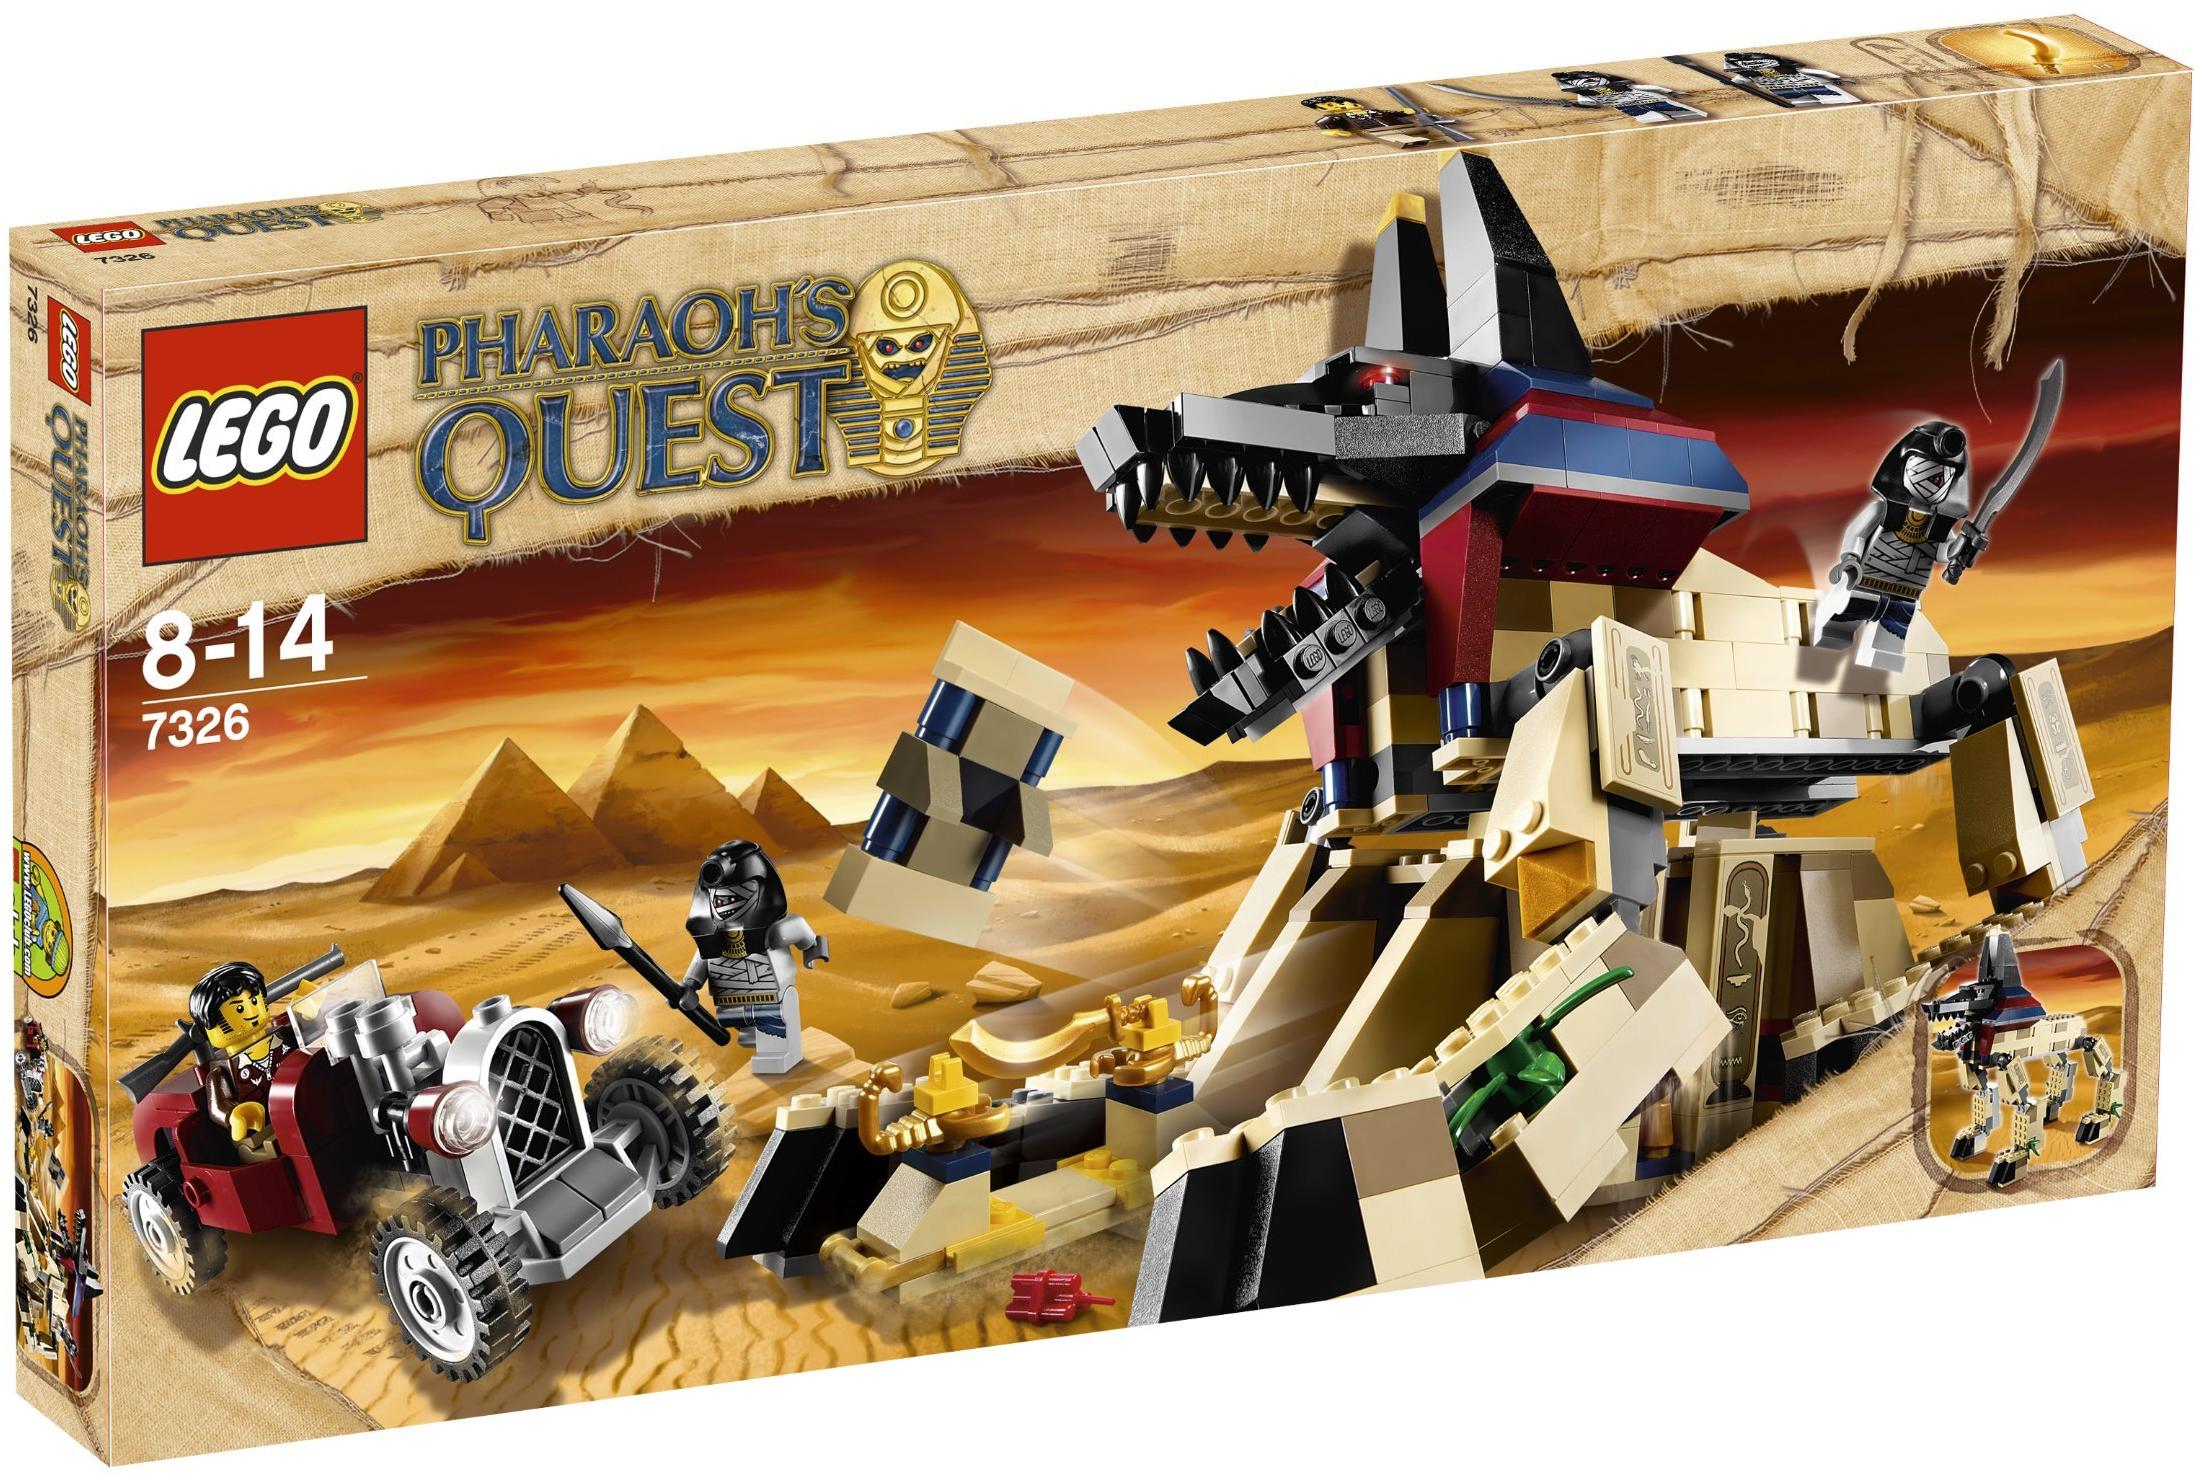 LEGO 853168 Pharaoh/'s Quest Mummy Warrior Minifigure w// Shield